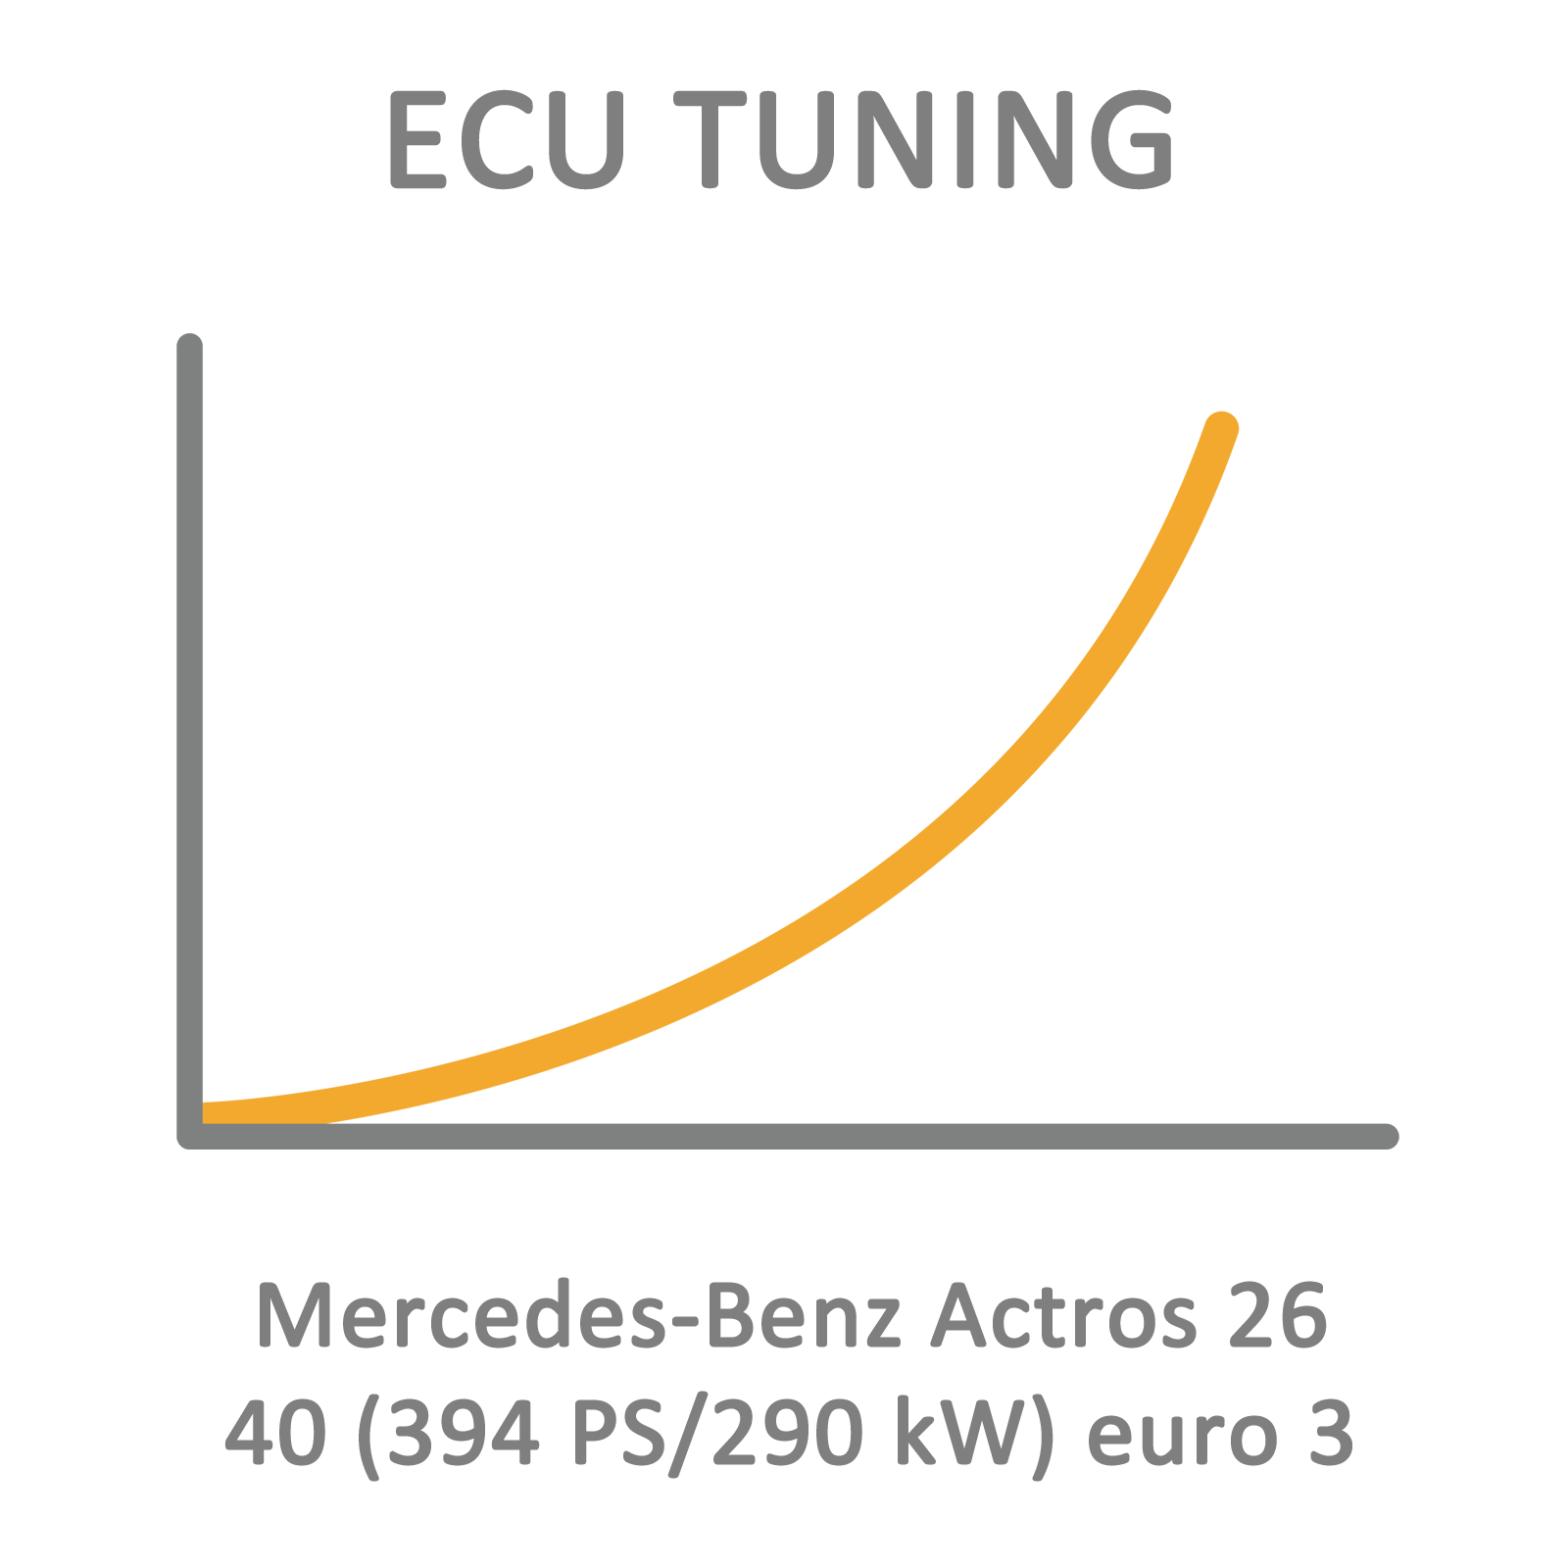 Mercedes-Benz Actros 26 40 (394 PS/290 kW) euro 3 ECU